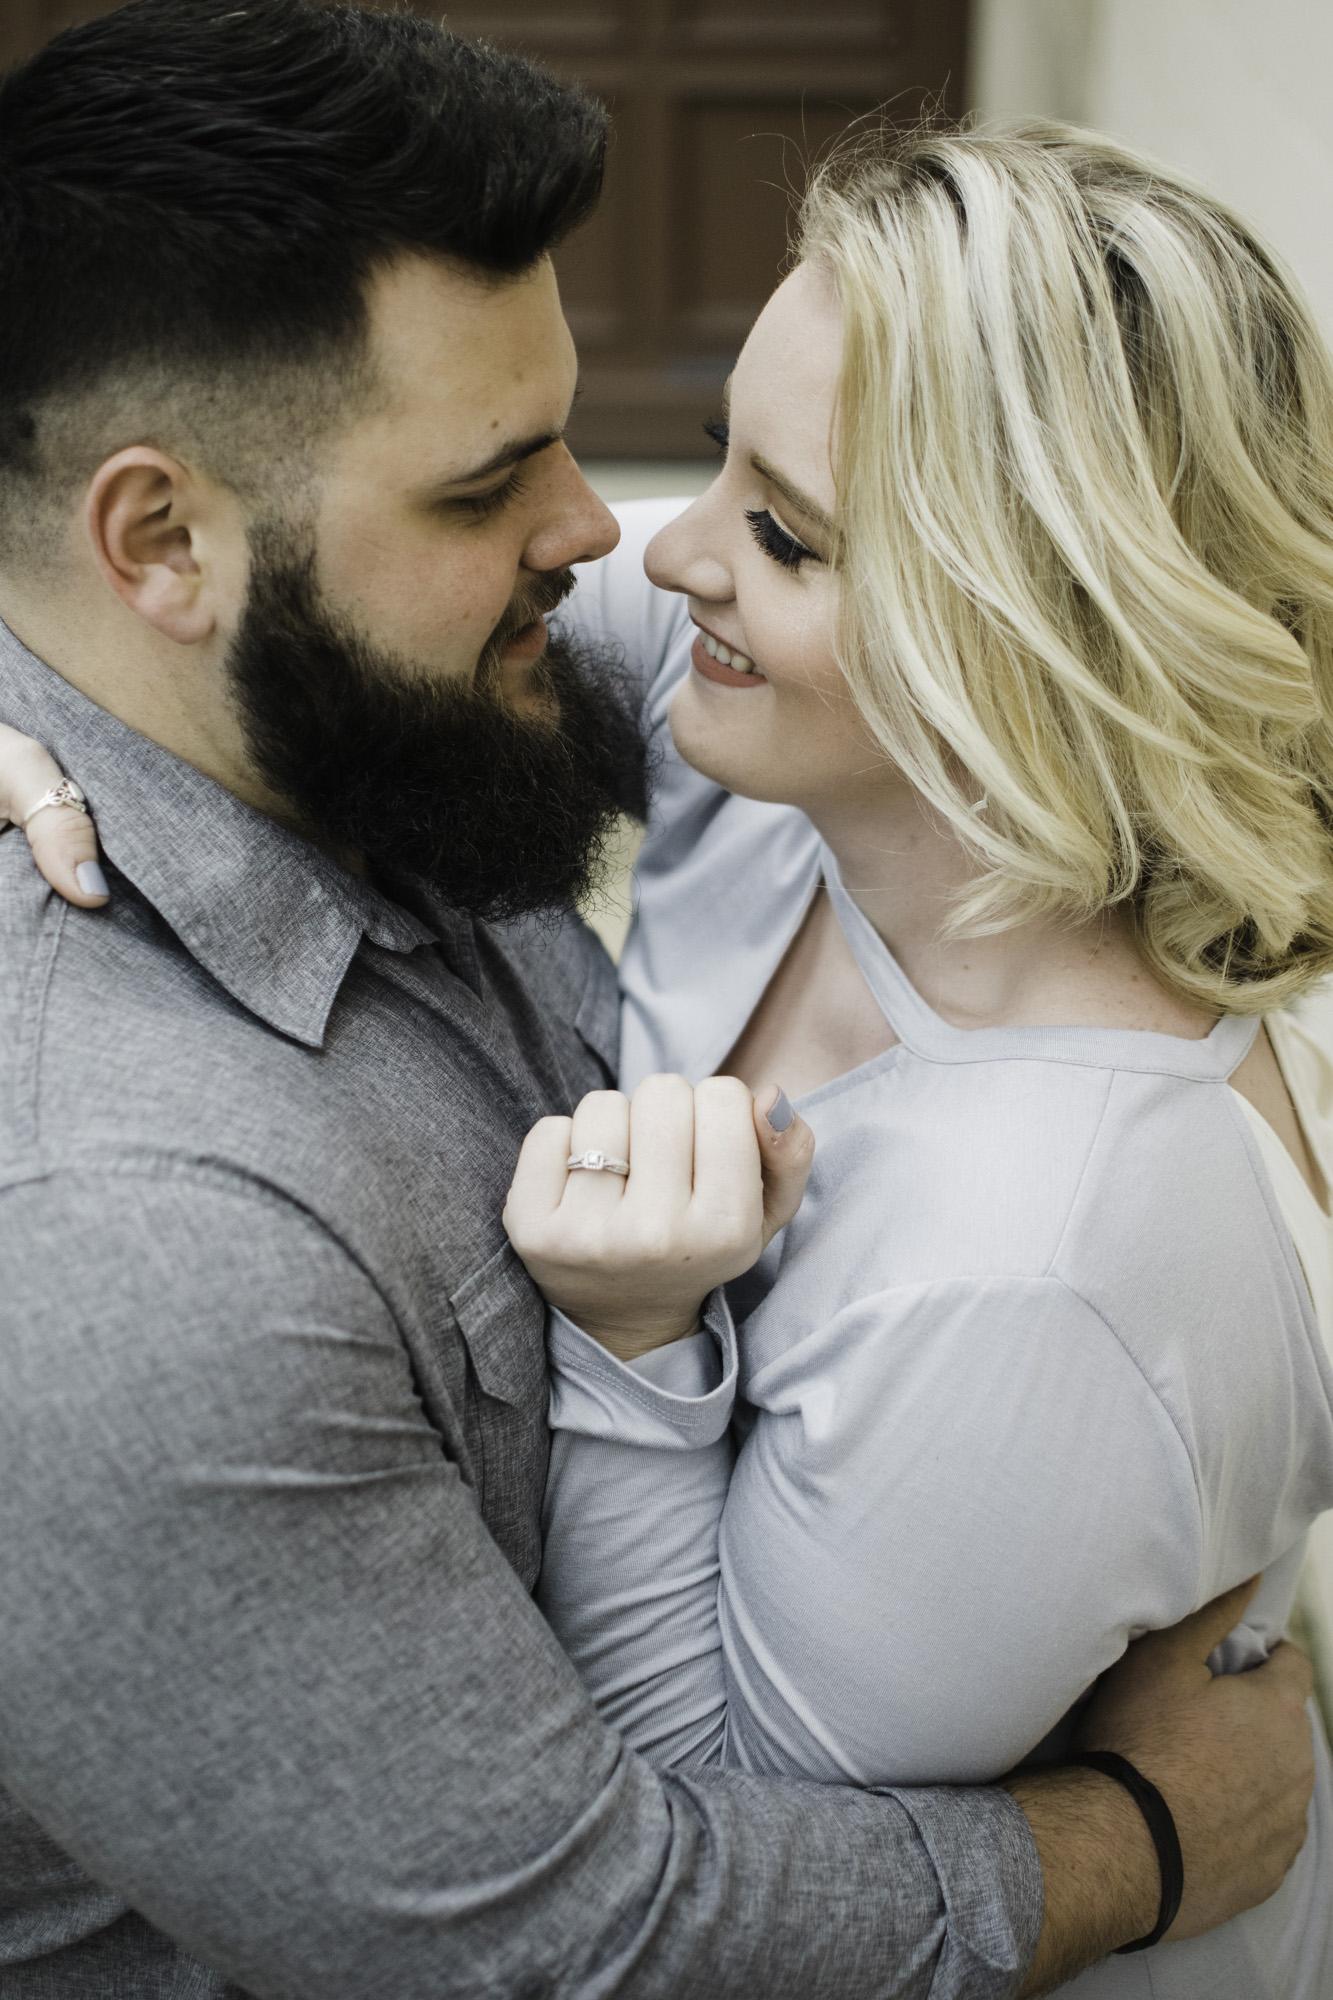 Cate_Ann_Photography_Dayton_Ohio_Wedding_And_Engagement_PhotographerDSC_2828.jpg